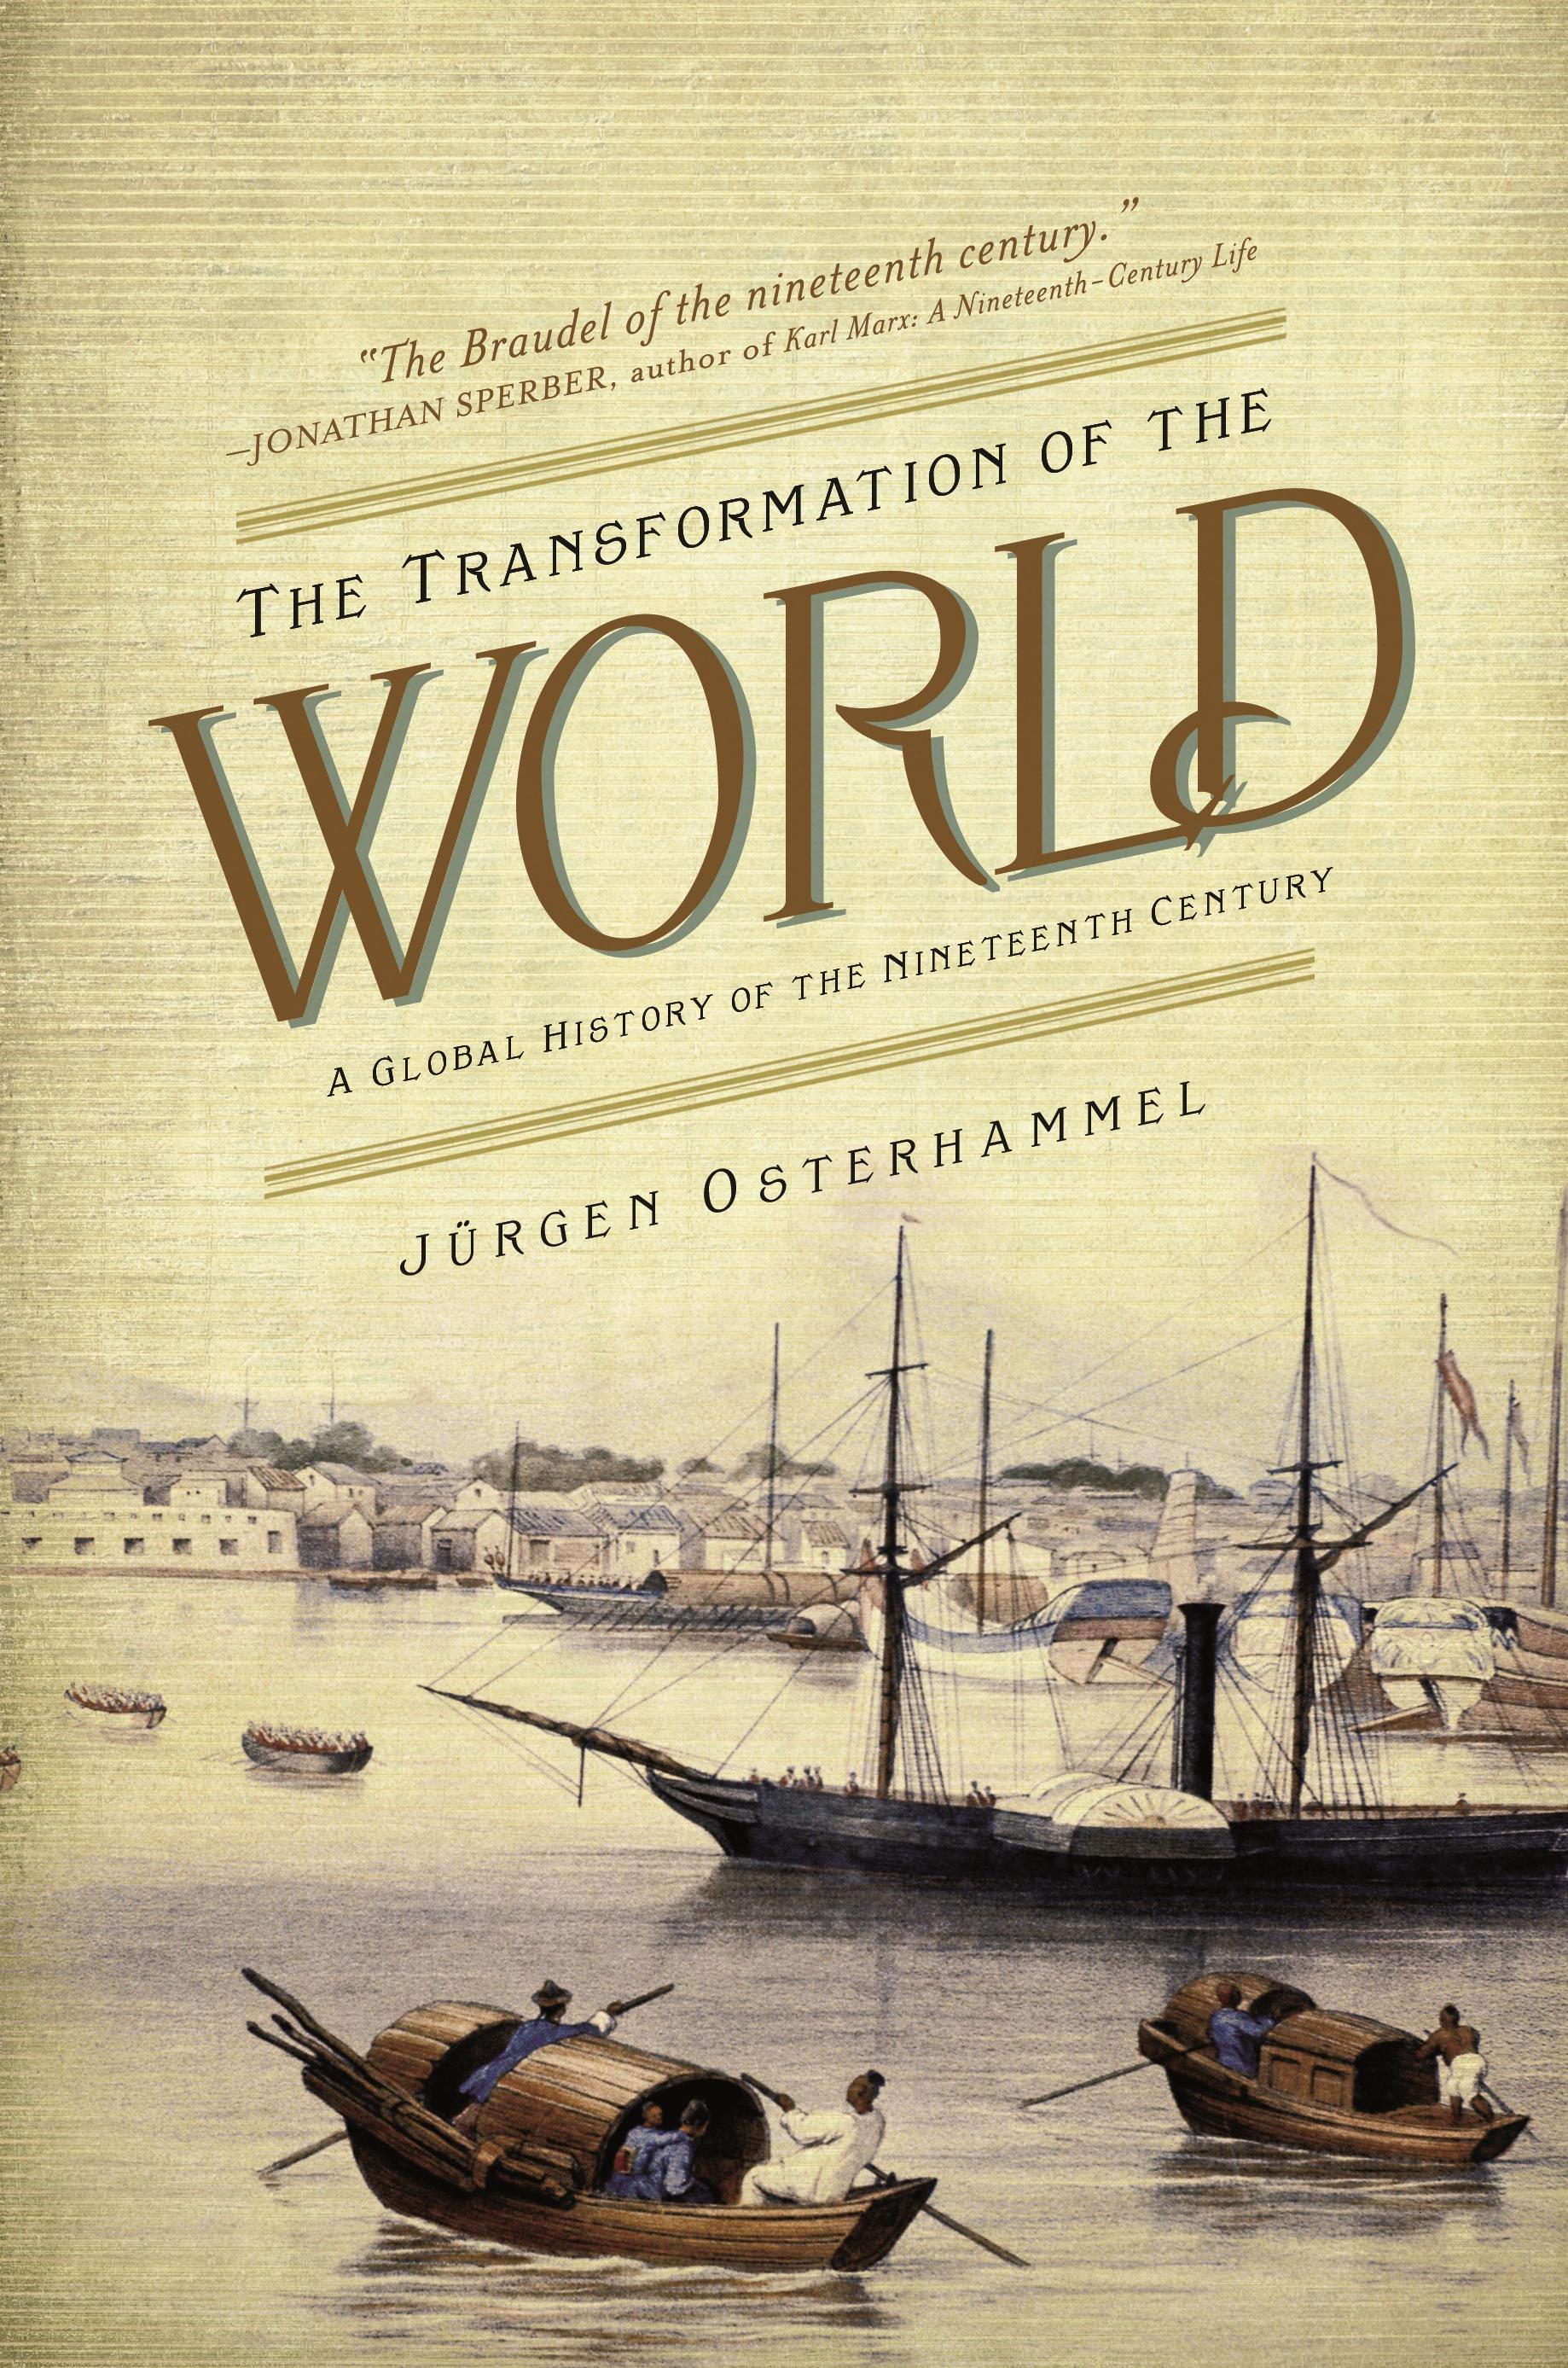 Download Ebook The Transformation of the World by Jürgen Osterhammel Pdf